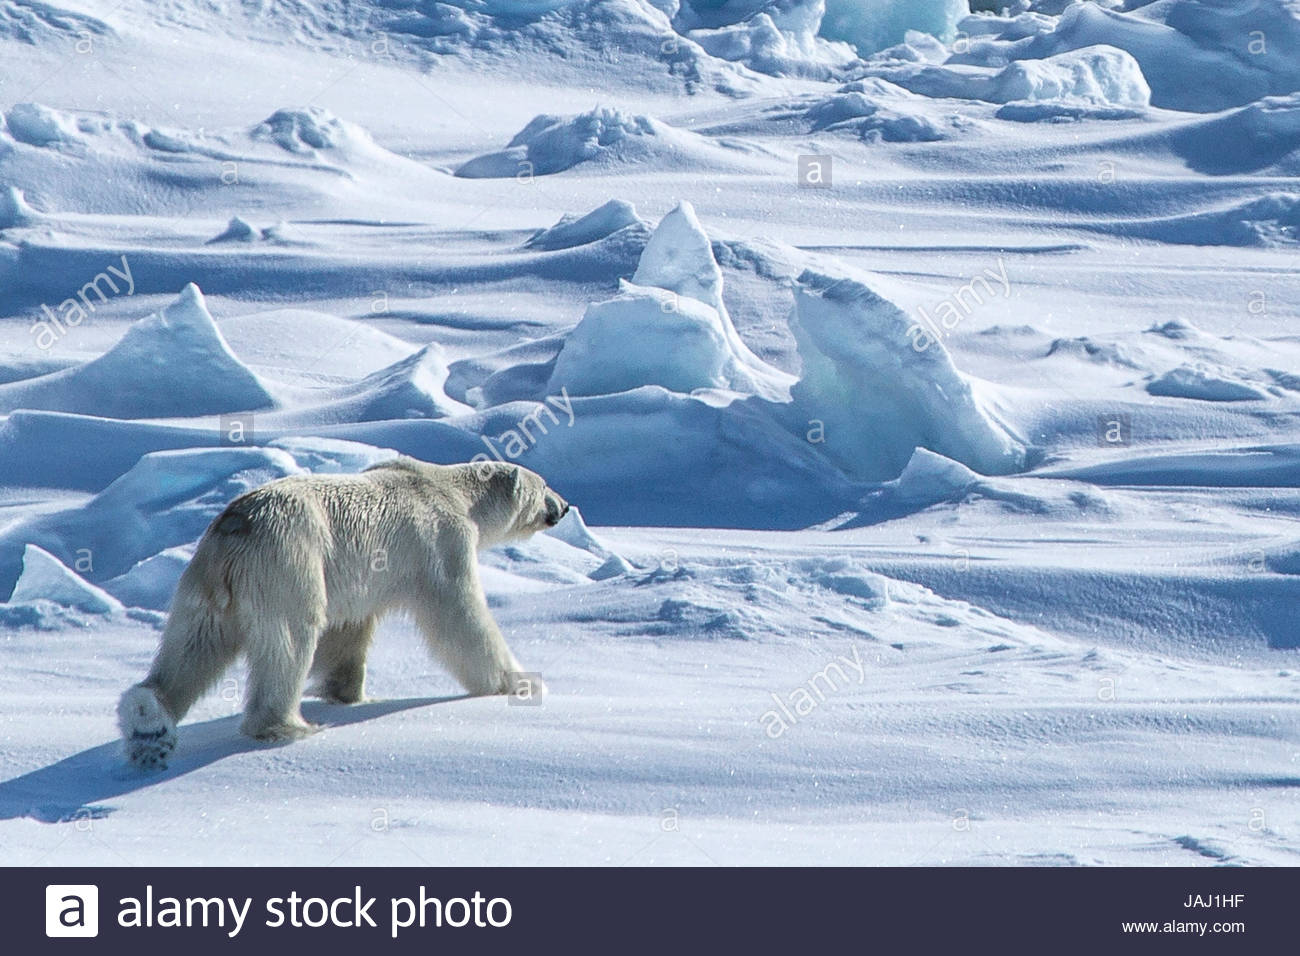 A polar bear, Ursus maritimus, on the pack ice in Hinlopenstretet. - Stock Image